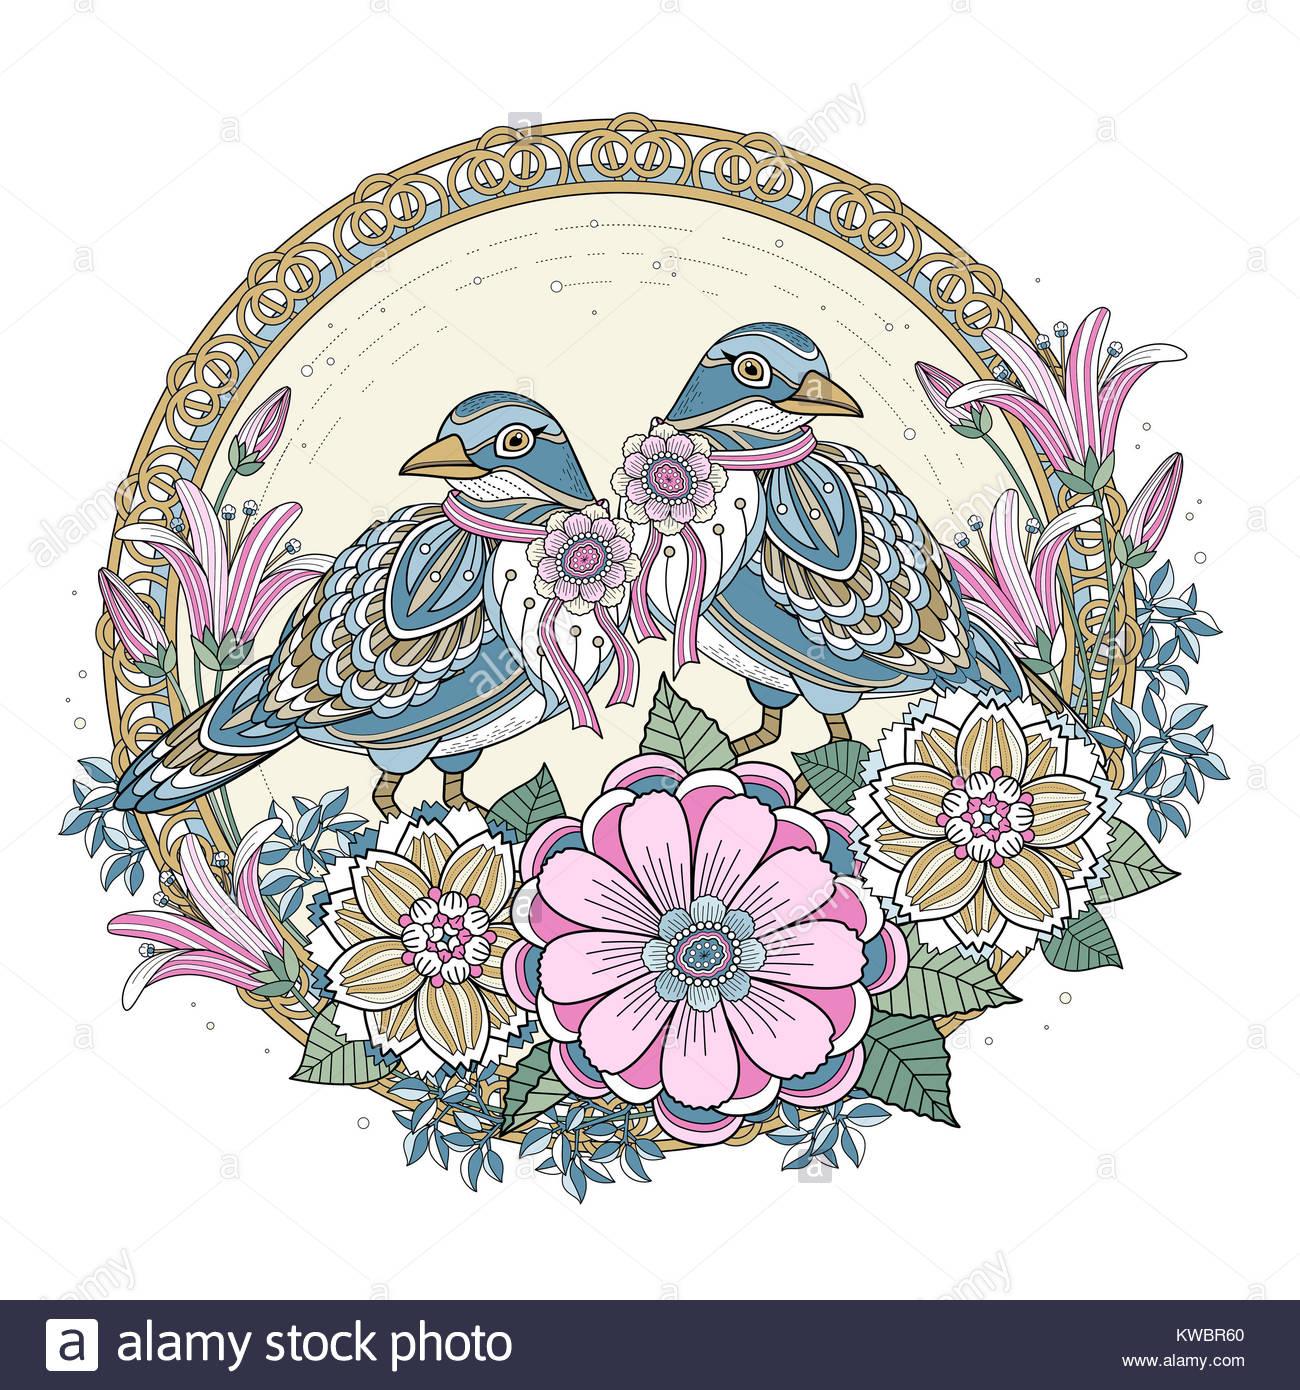 Illustration Line Drawing Blessing Stockfotos & Illustration Line ...